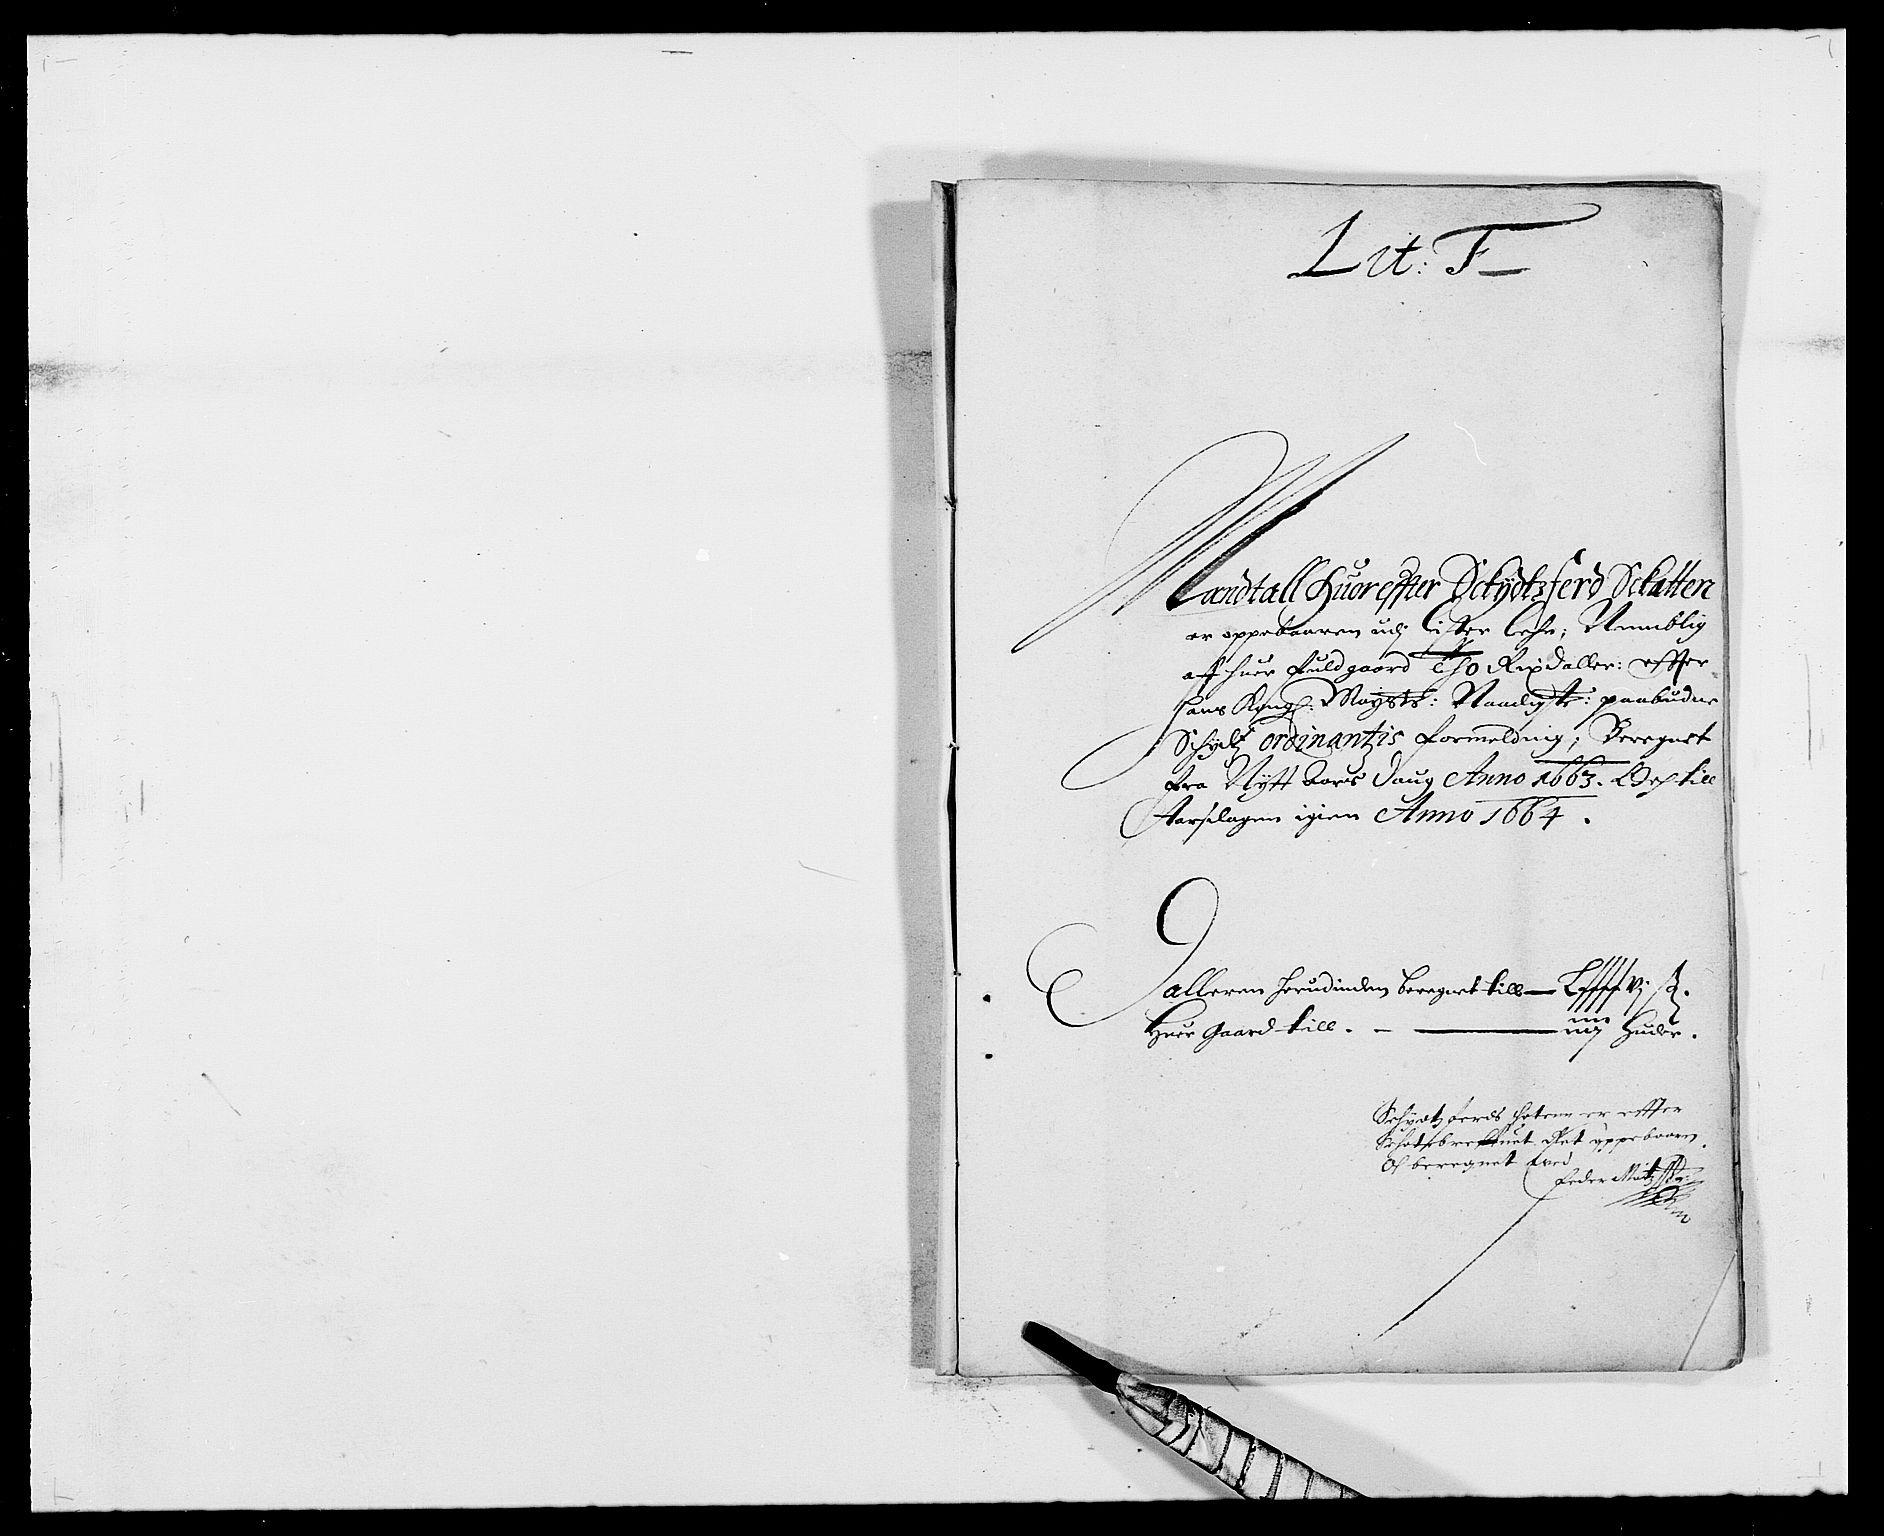 RA, Rentekammeret inntil 1814, Reviderte regnskaper, Fogderegnskap, R41/L2523: Fogderegnskap Lista, 1663-1664, s. 116